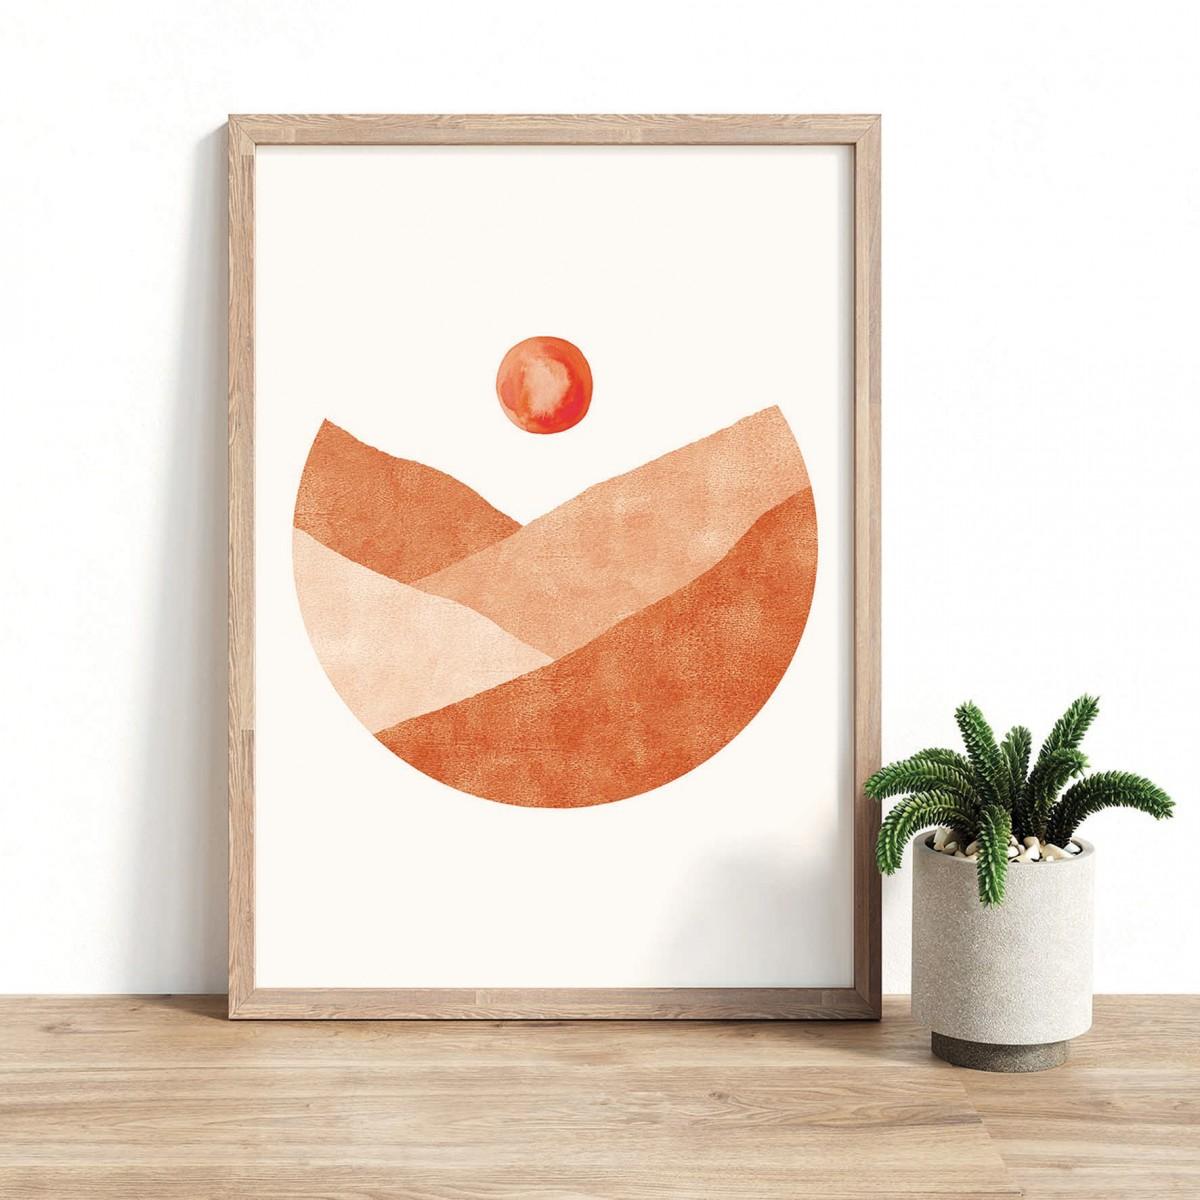 Paperlandscape | Kunstdruck | Landschaft Terrakotta | abstrakt | Kreis | verschiedene Größen